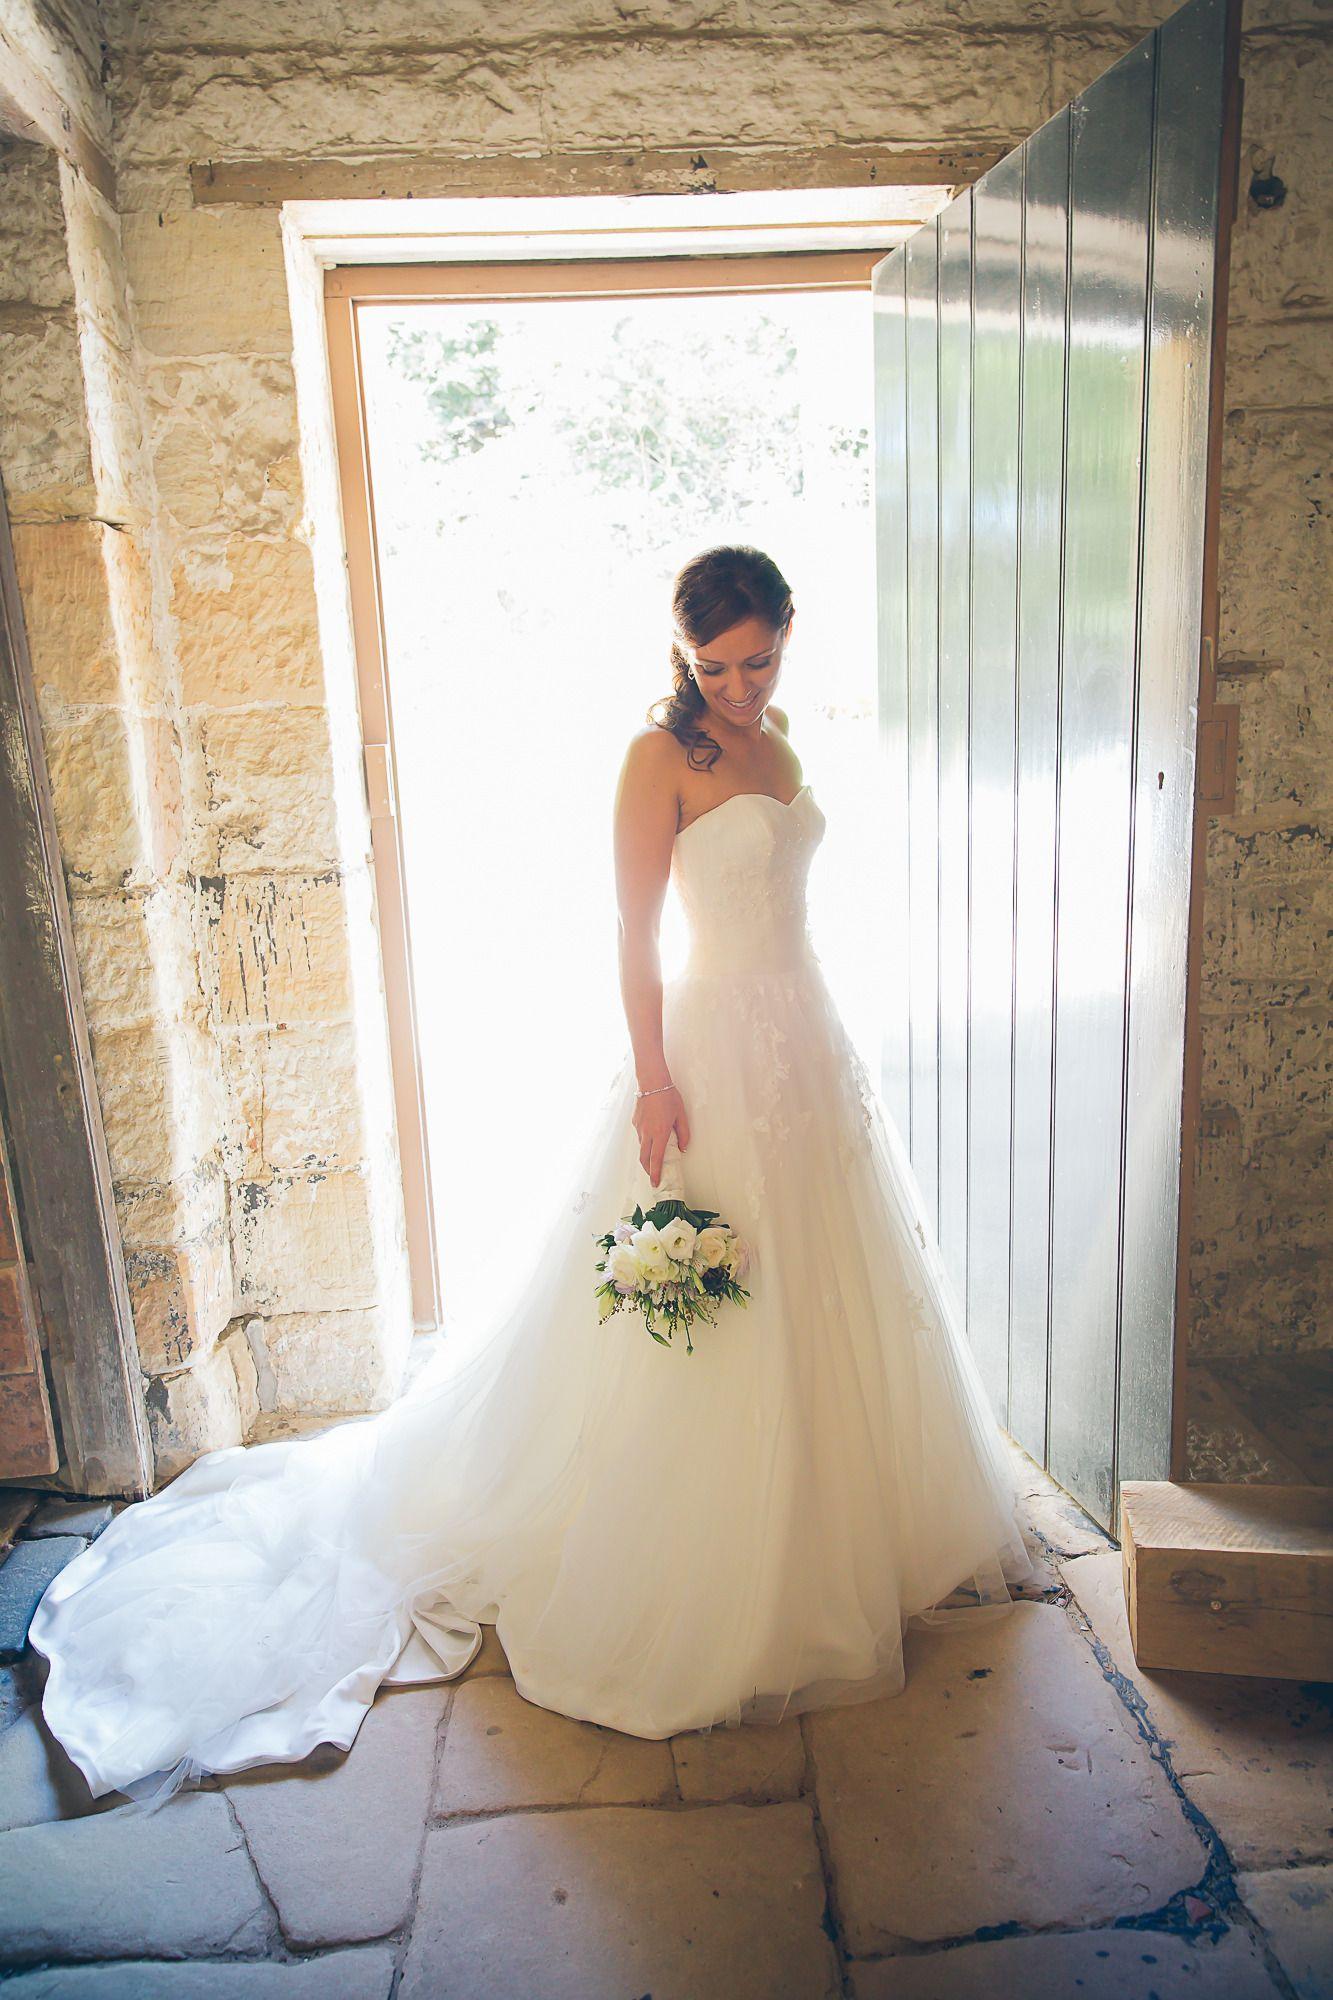 Diy Sydney Garden Wedding From Kristy Toepfer Photography Wedding Sydney Gardens Wedding Story